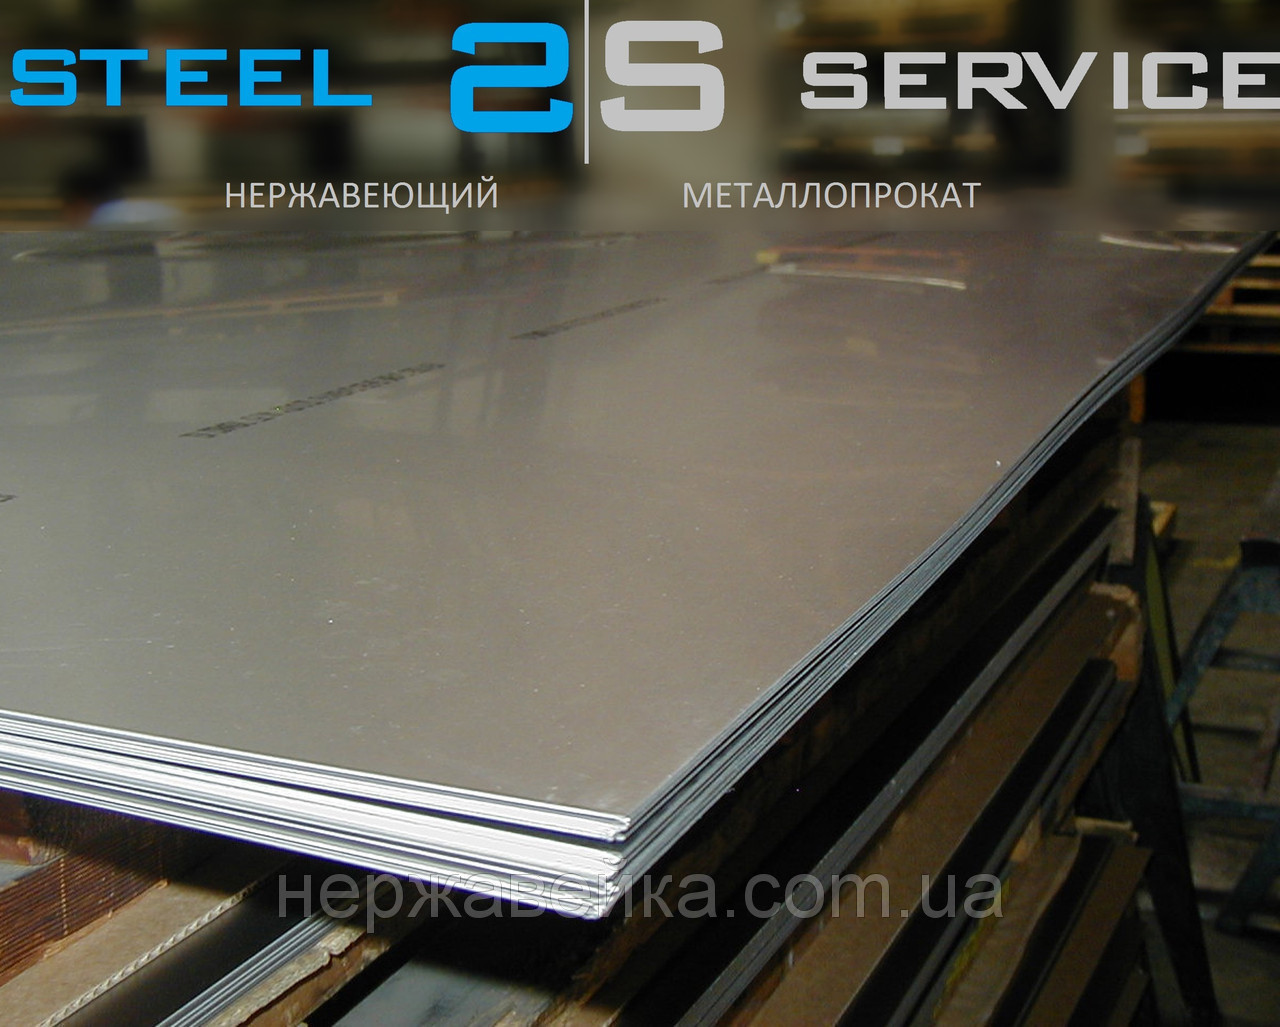 Нержавеющий лист 1х1250х2500мм AiSi 202  (12Х17Г9АН4) - 4N - шлифованный